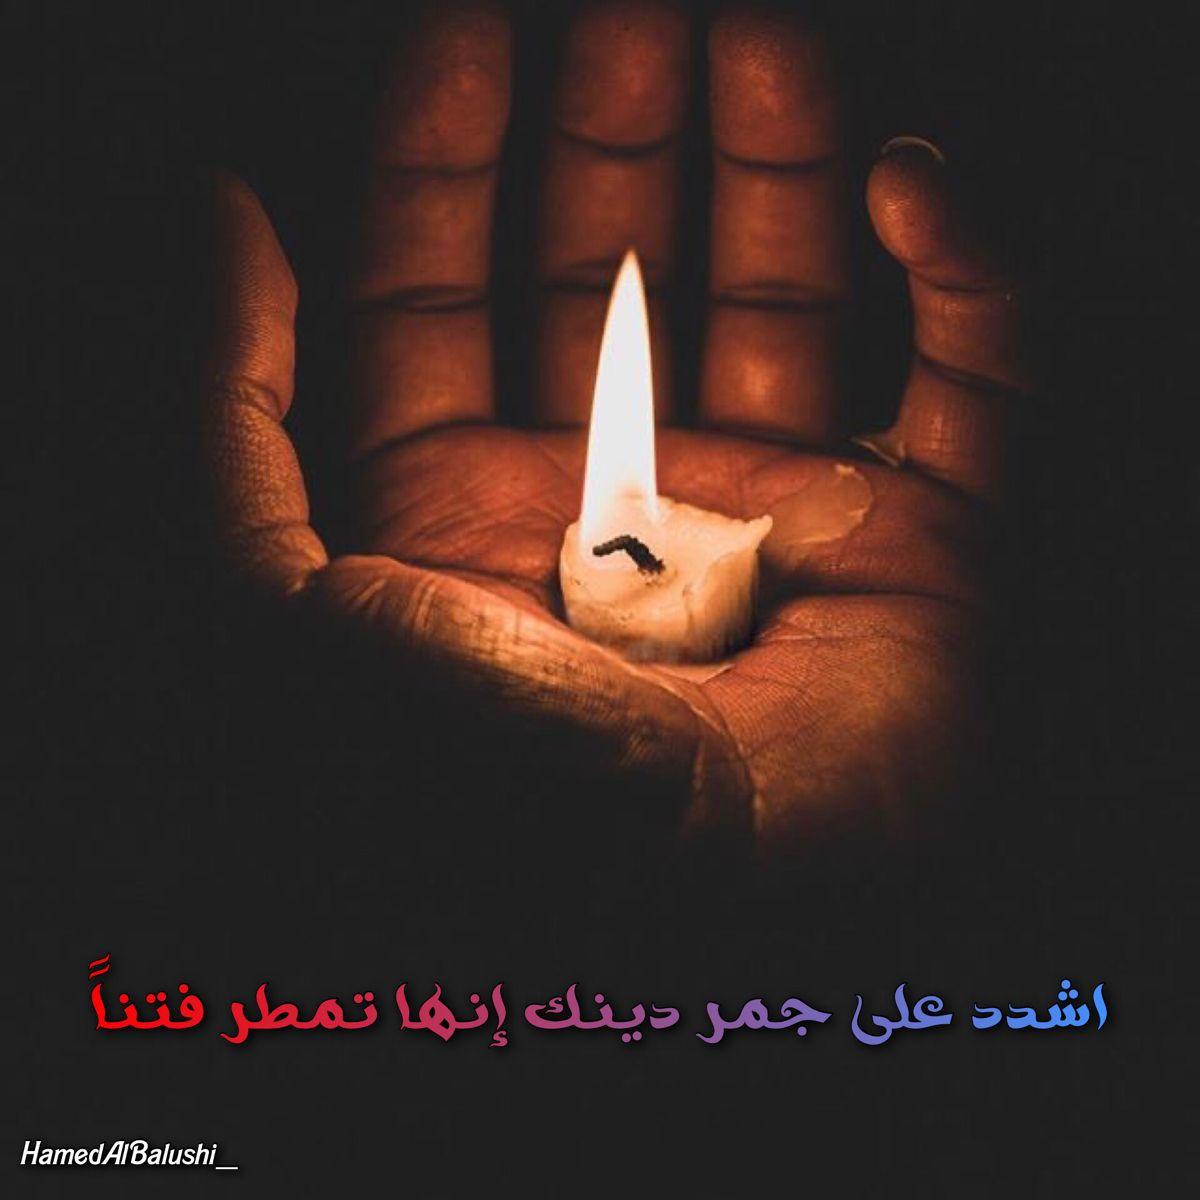 Pin By حمد البلوشي On موعظة Birthday Candles Candles Birthday